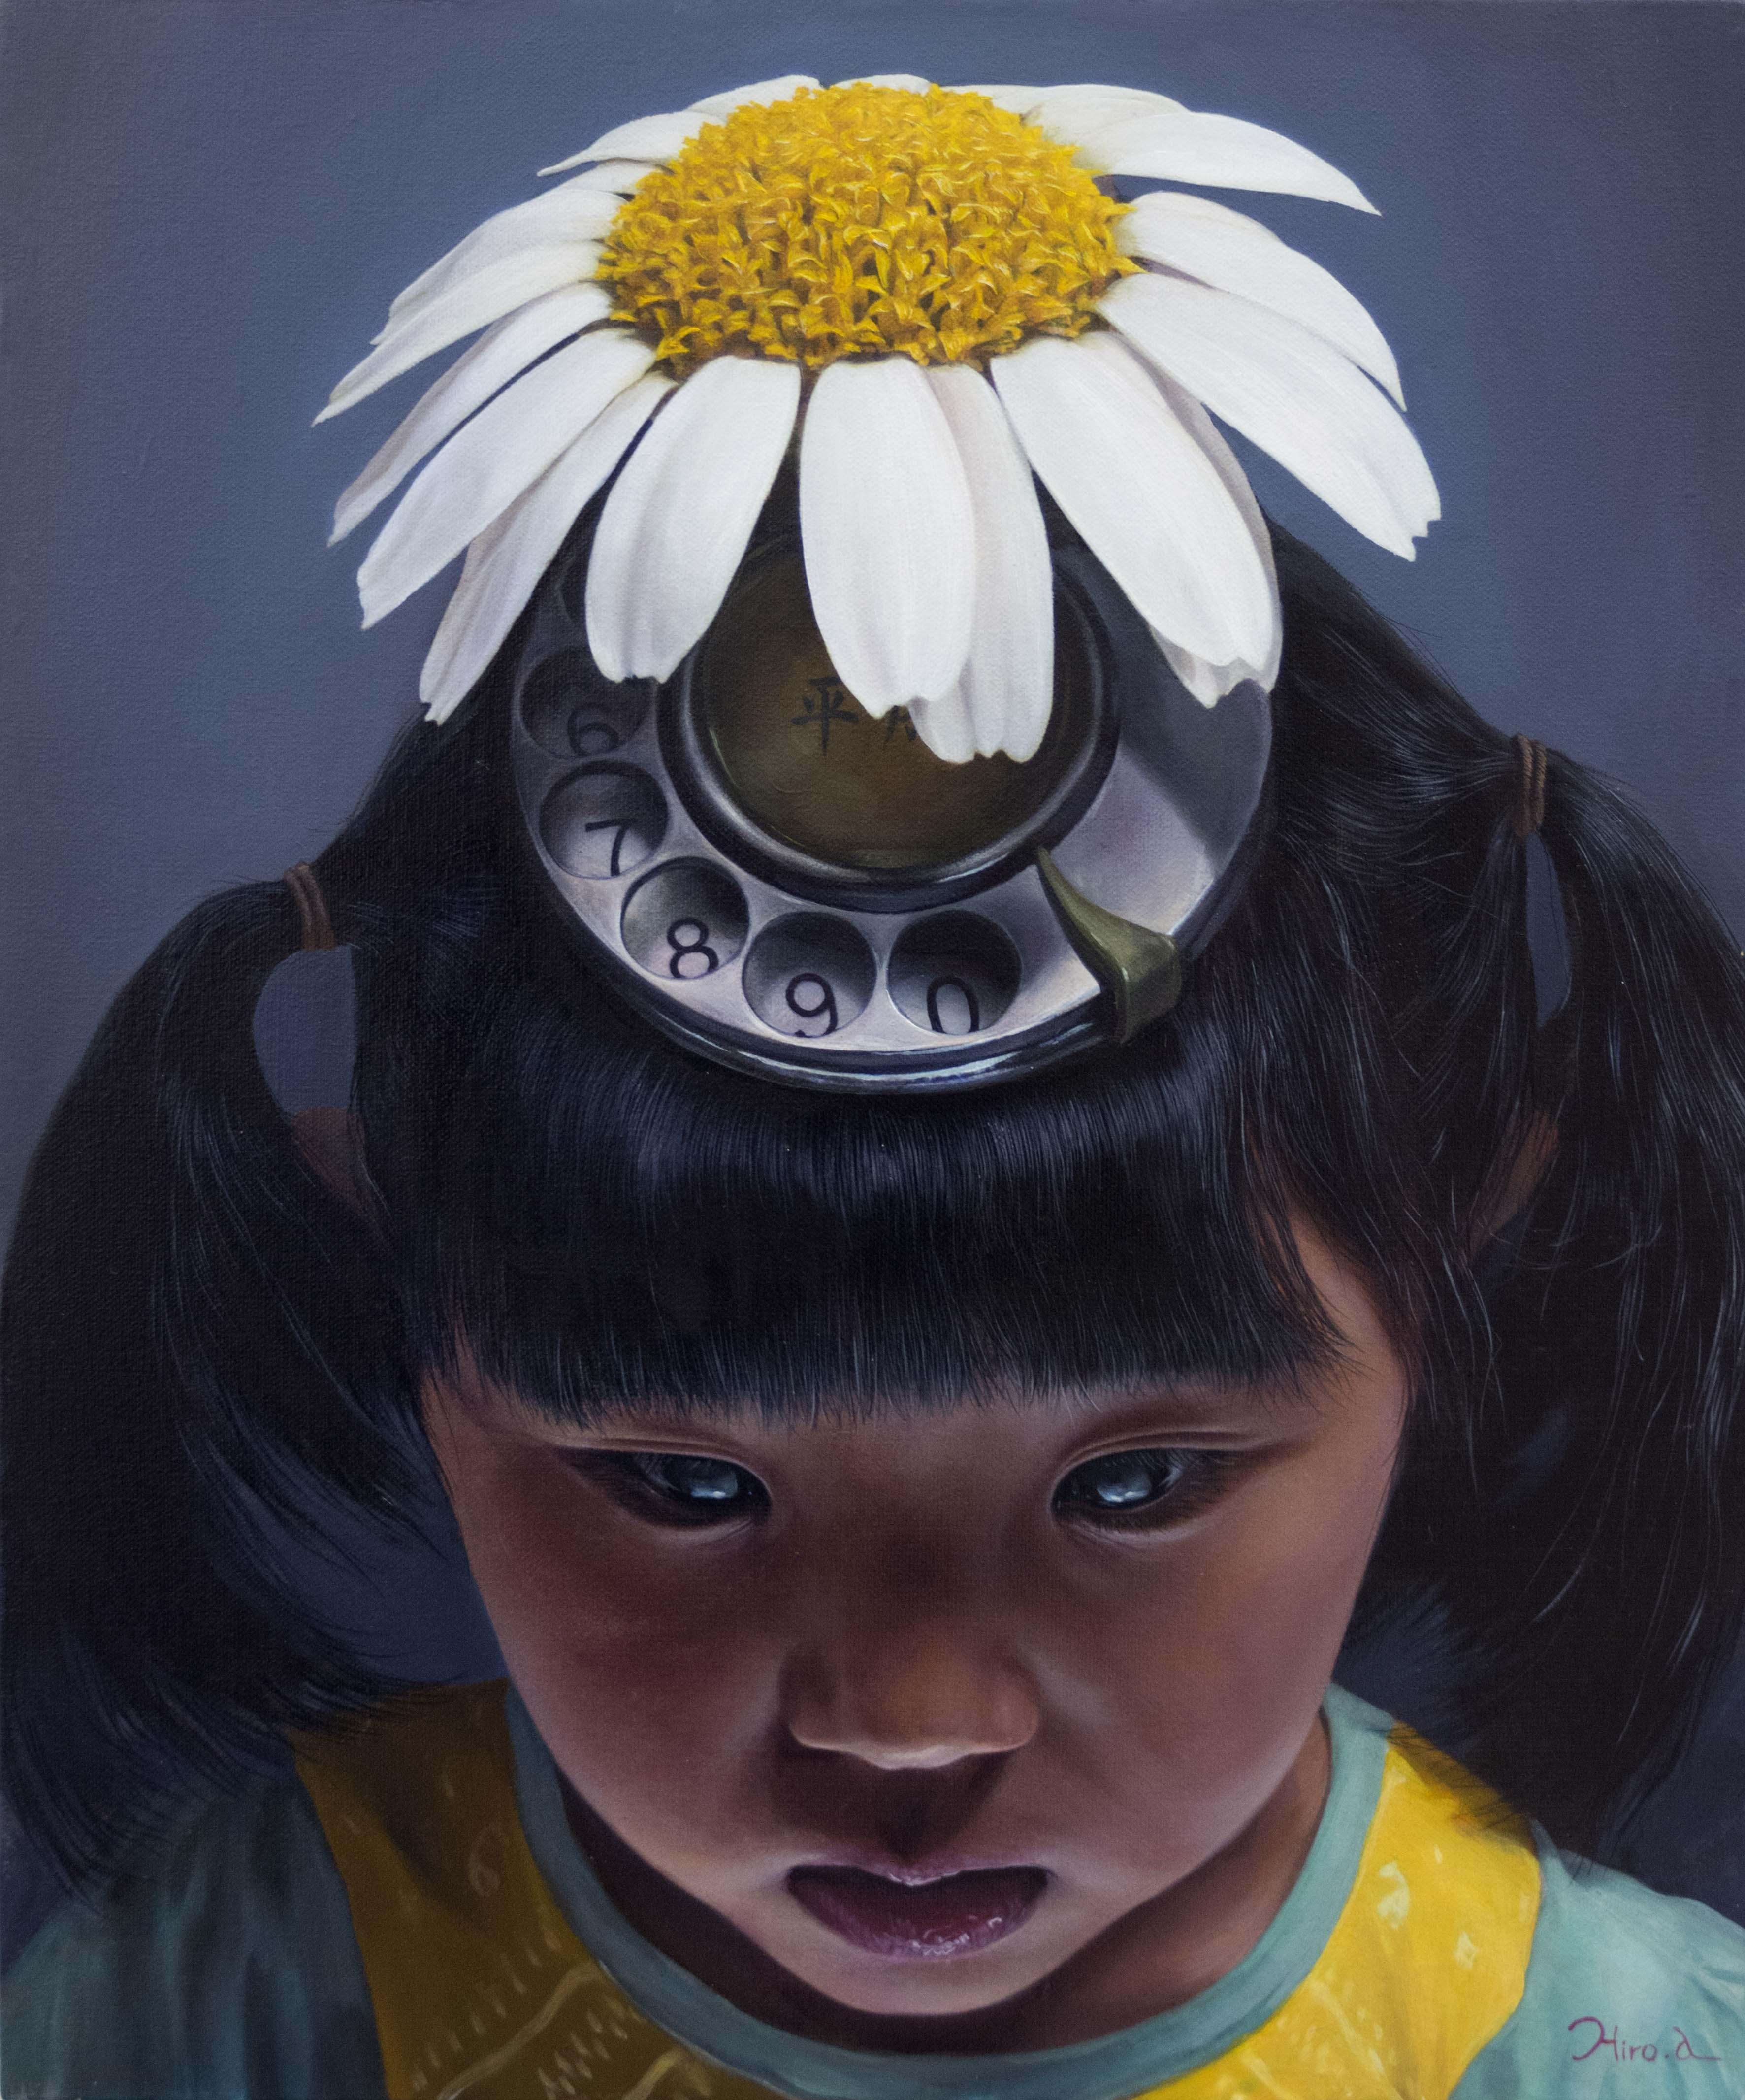 Hiroyuki Aoyama, A I, h 455 x 380 mm